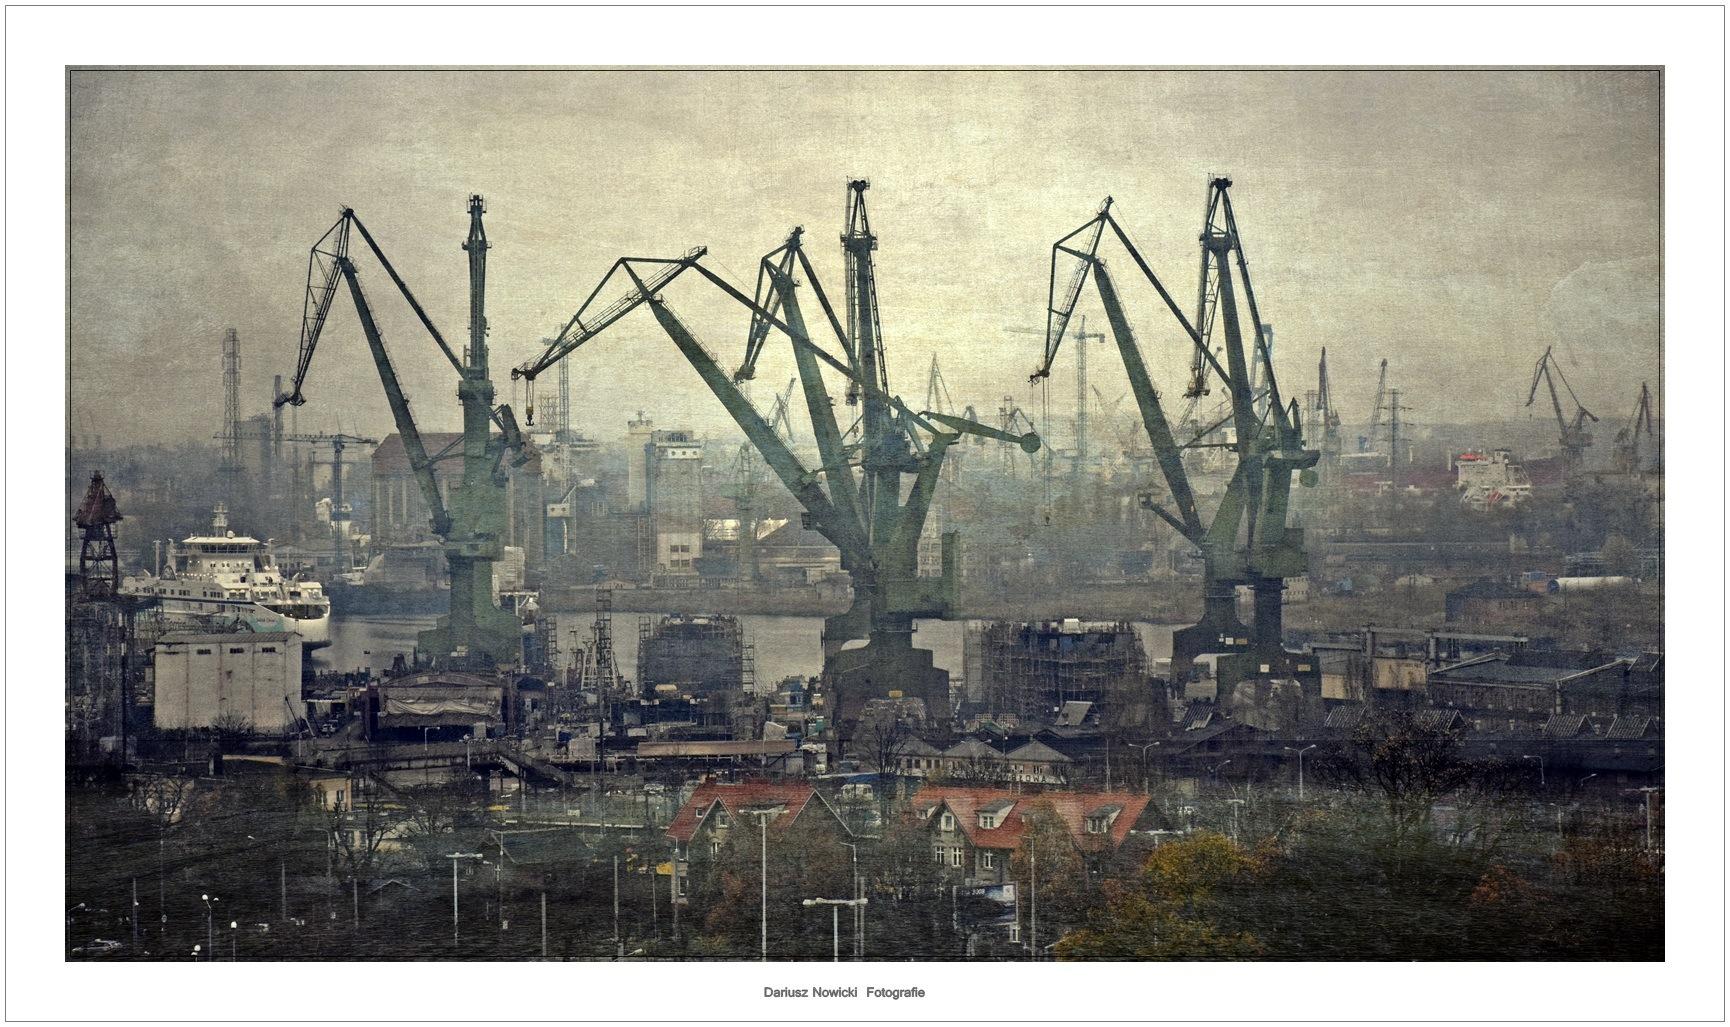 industrial by darnowic